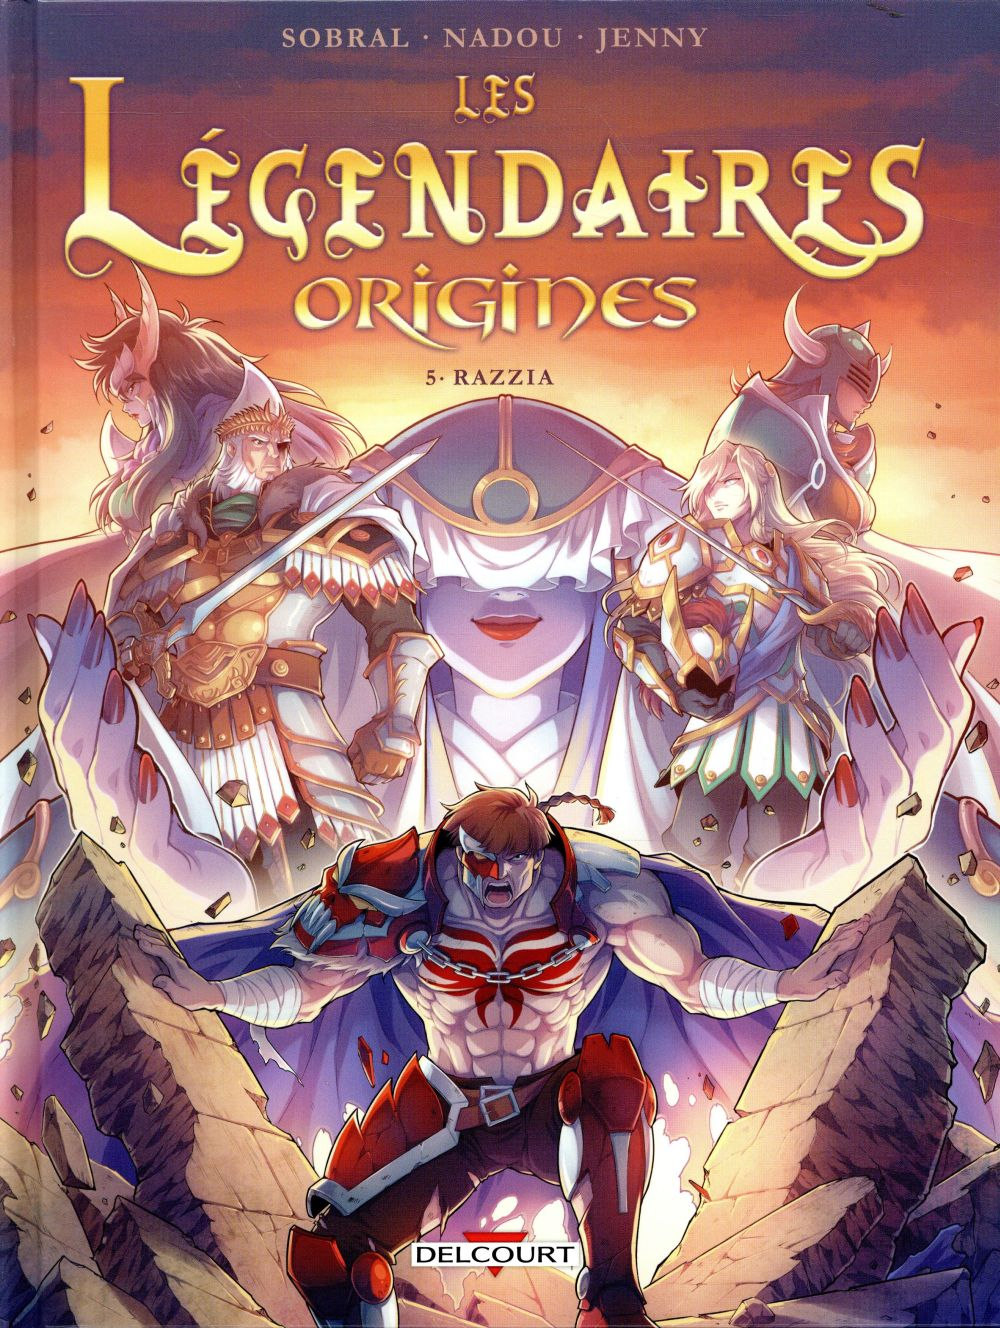 LEGENDAIRES - ORIGINES 5. RAZZ SOBRAL/NADOU/JENNY DELCOURT